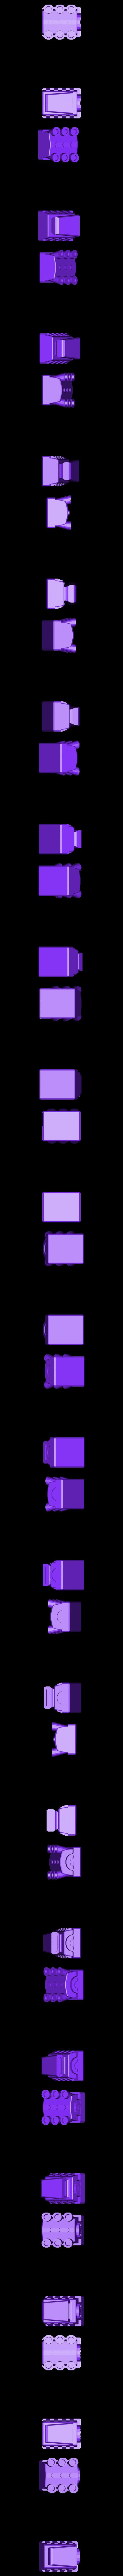 SmallToys-CarRacerEngines.stl Download STL file SmallToys - Cars pack • 3D print design, Wabby